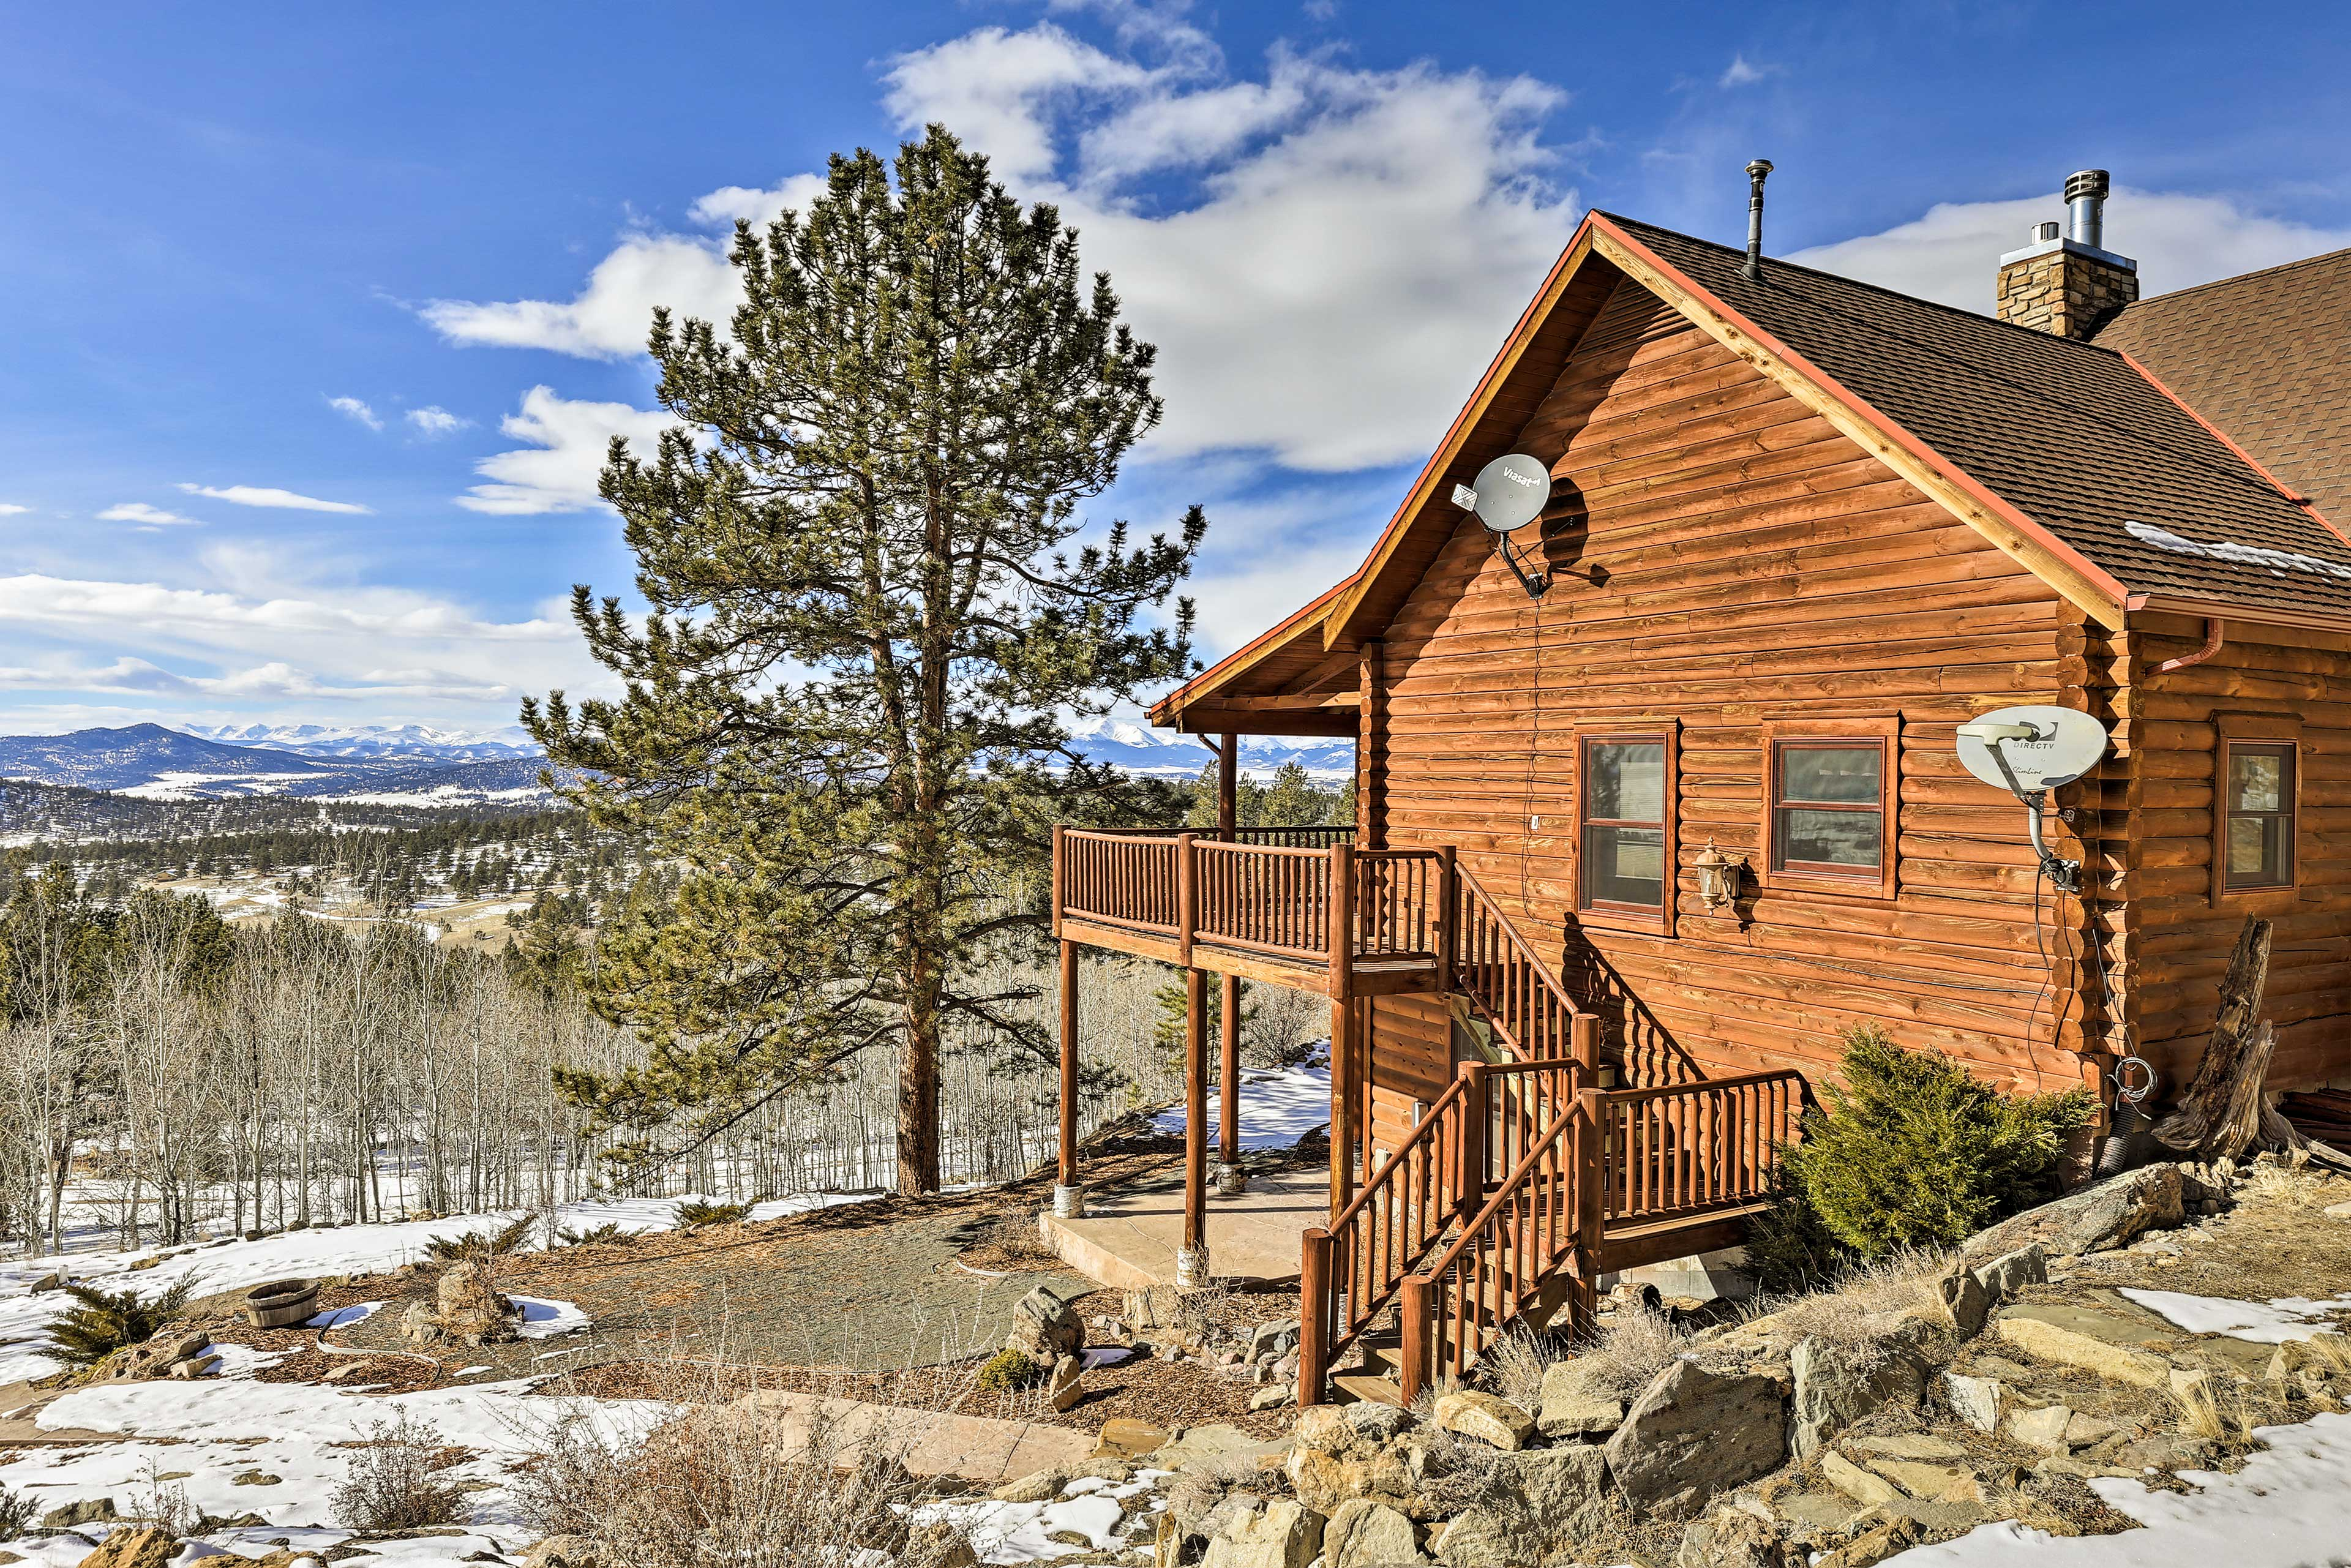 This cabin provides the perfect mountain escape.